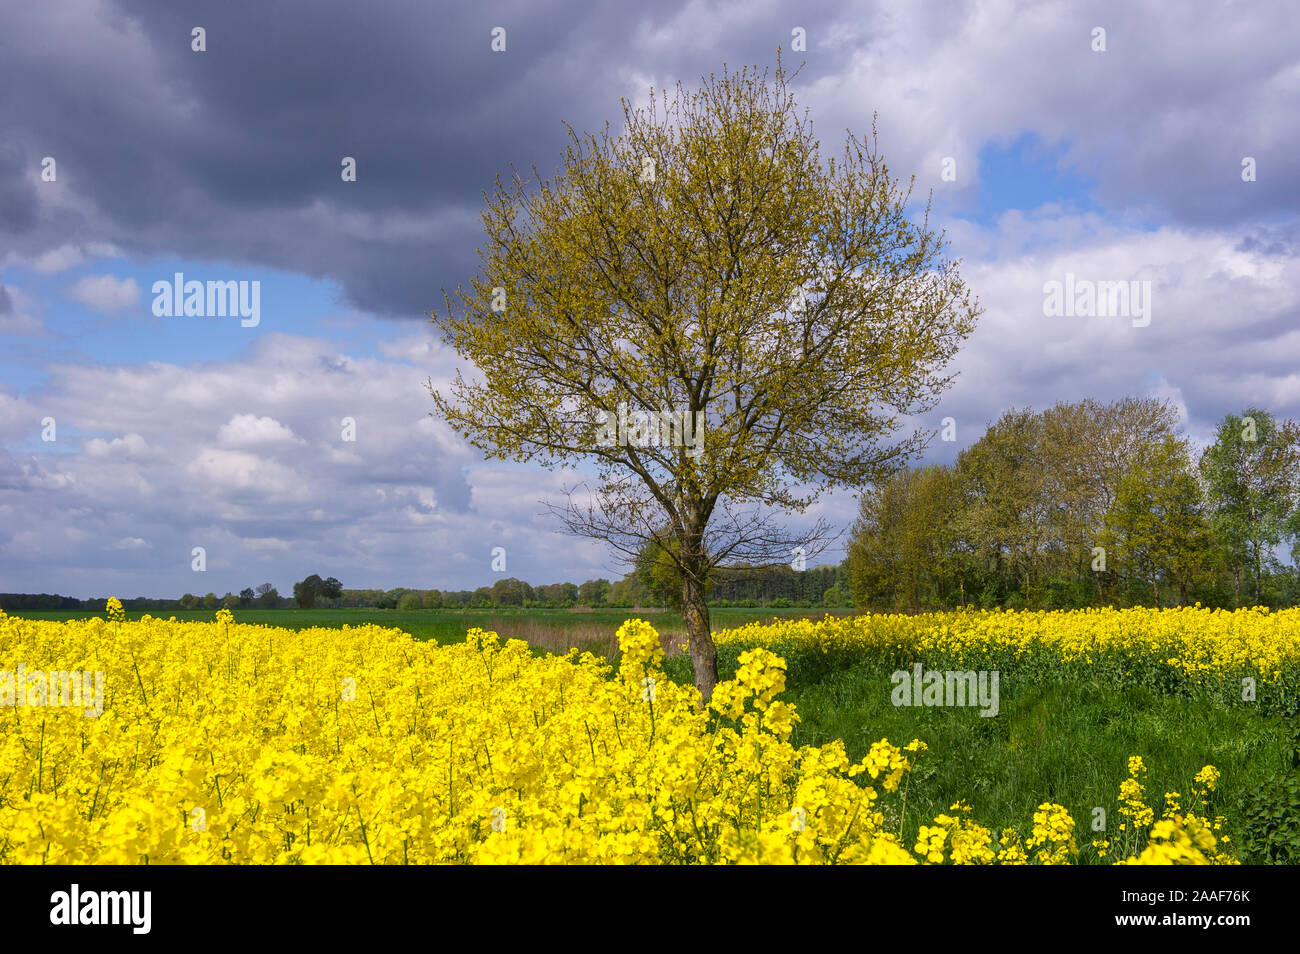 Baum am Rapsfeld, Niedersachsen, Stock Photo